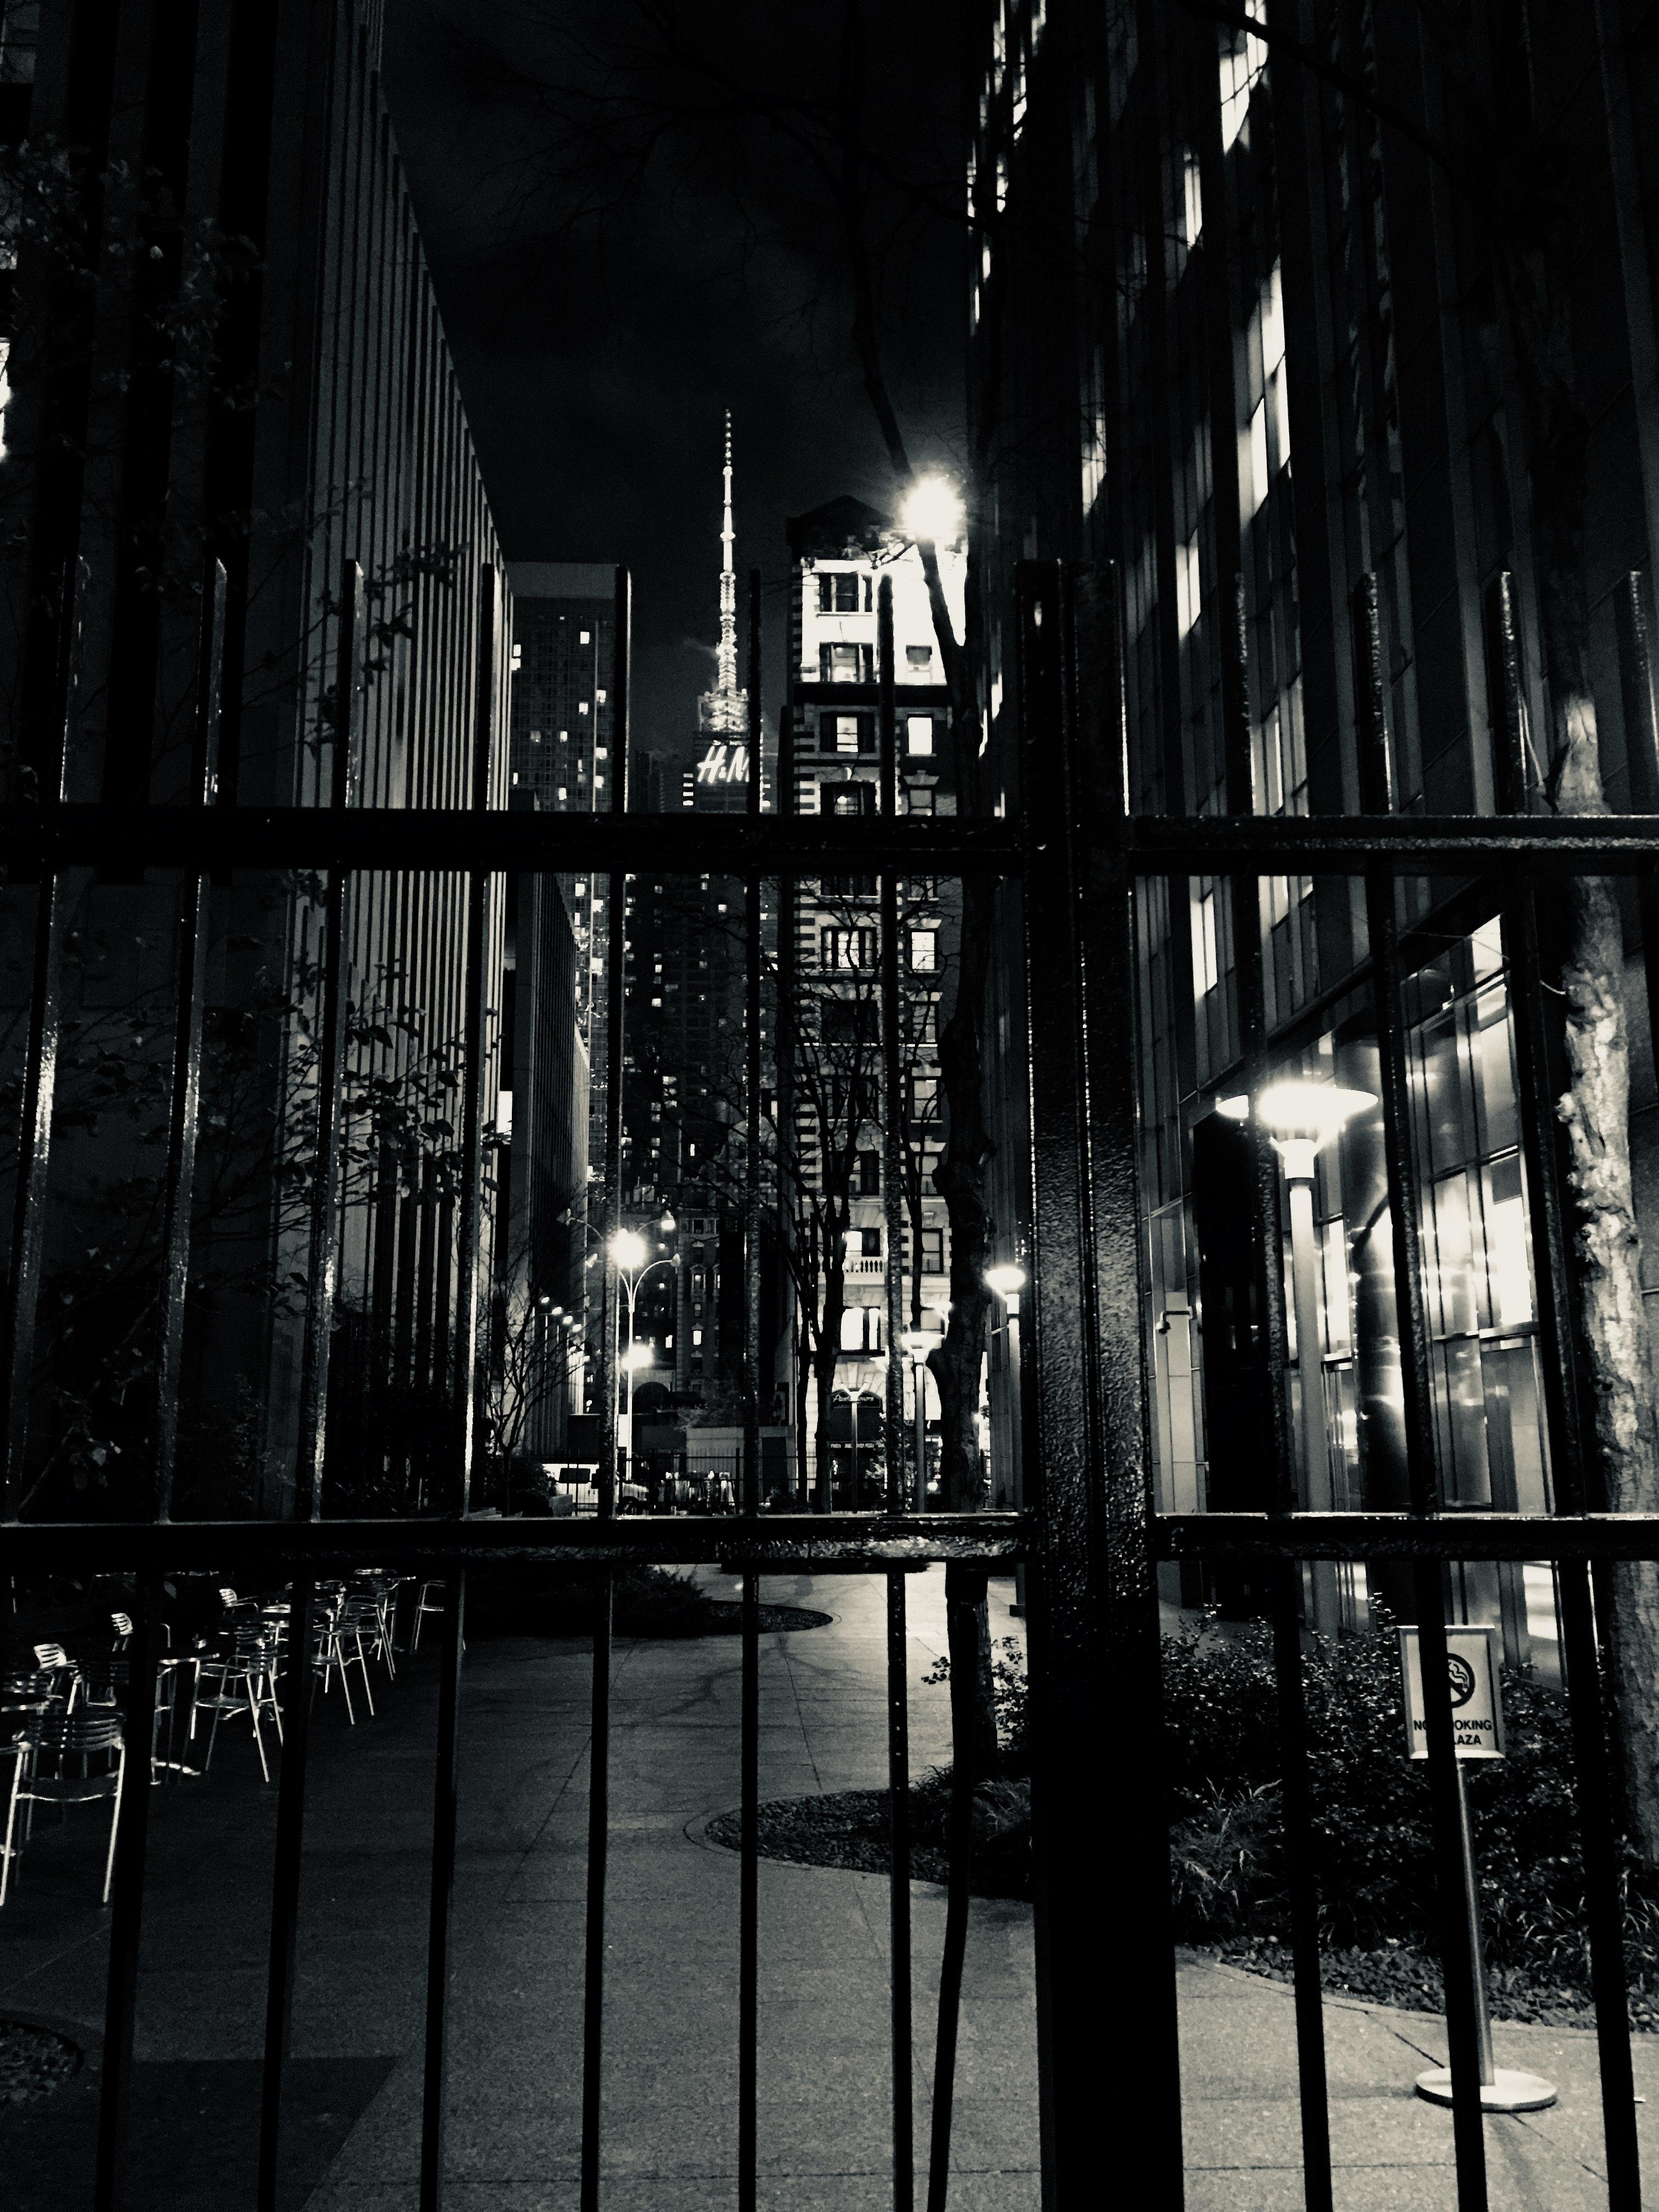 Photo of black steel house gate